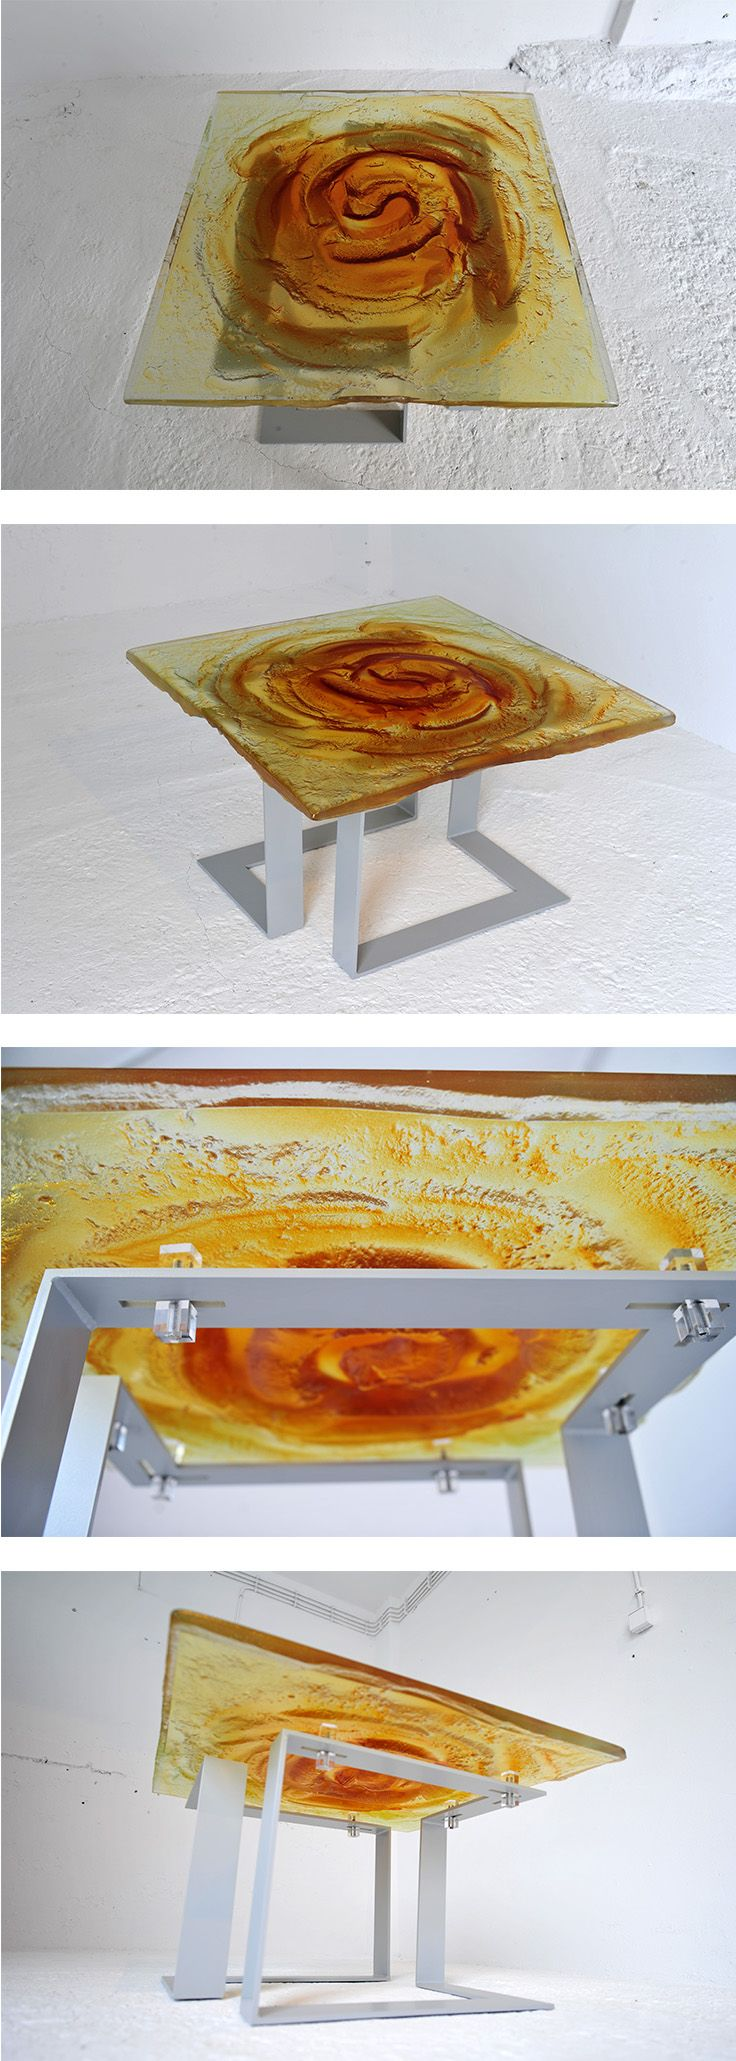 Archiglass Applied Arts Glass Table Stolik Szklany